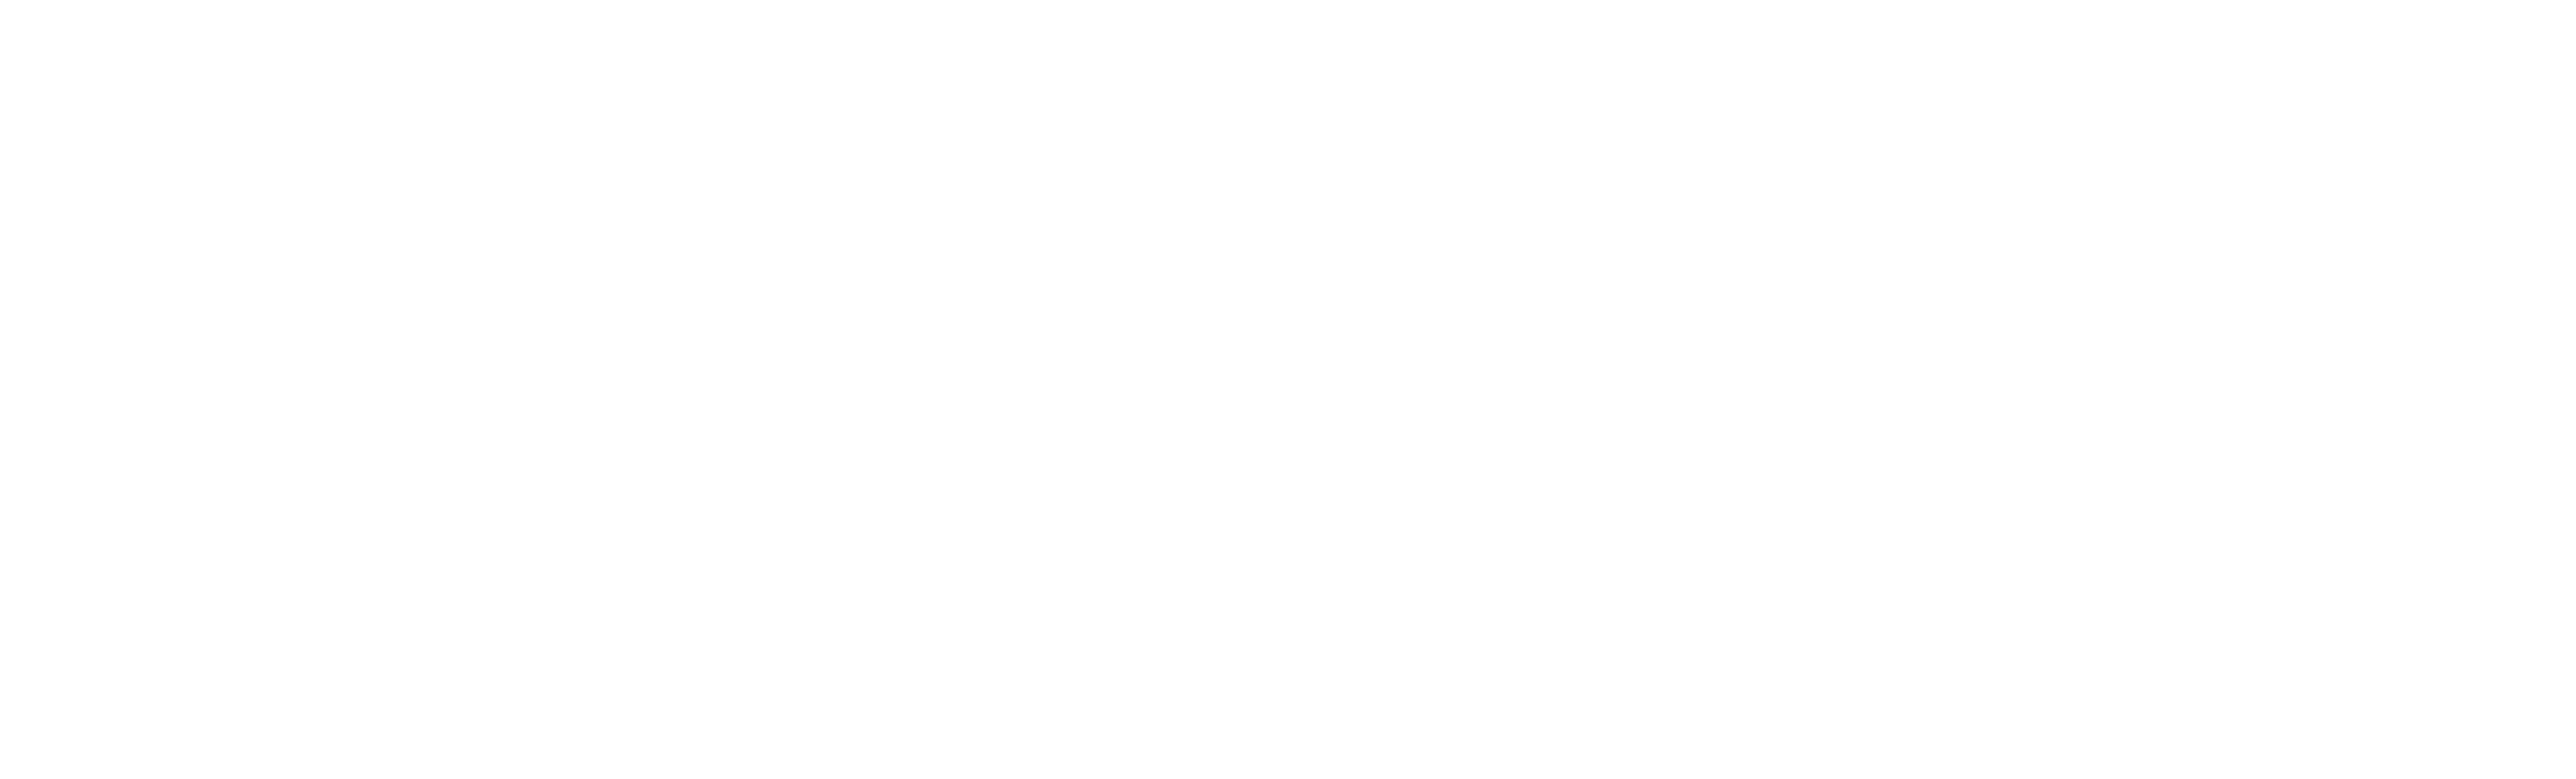 Jason Aldean's logo